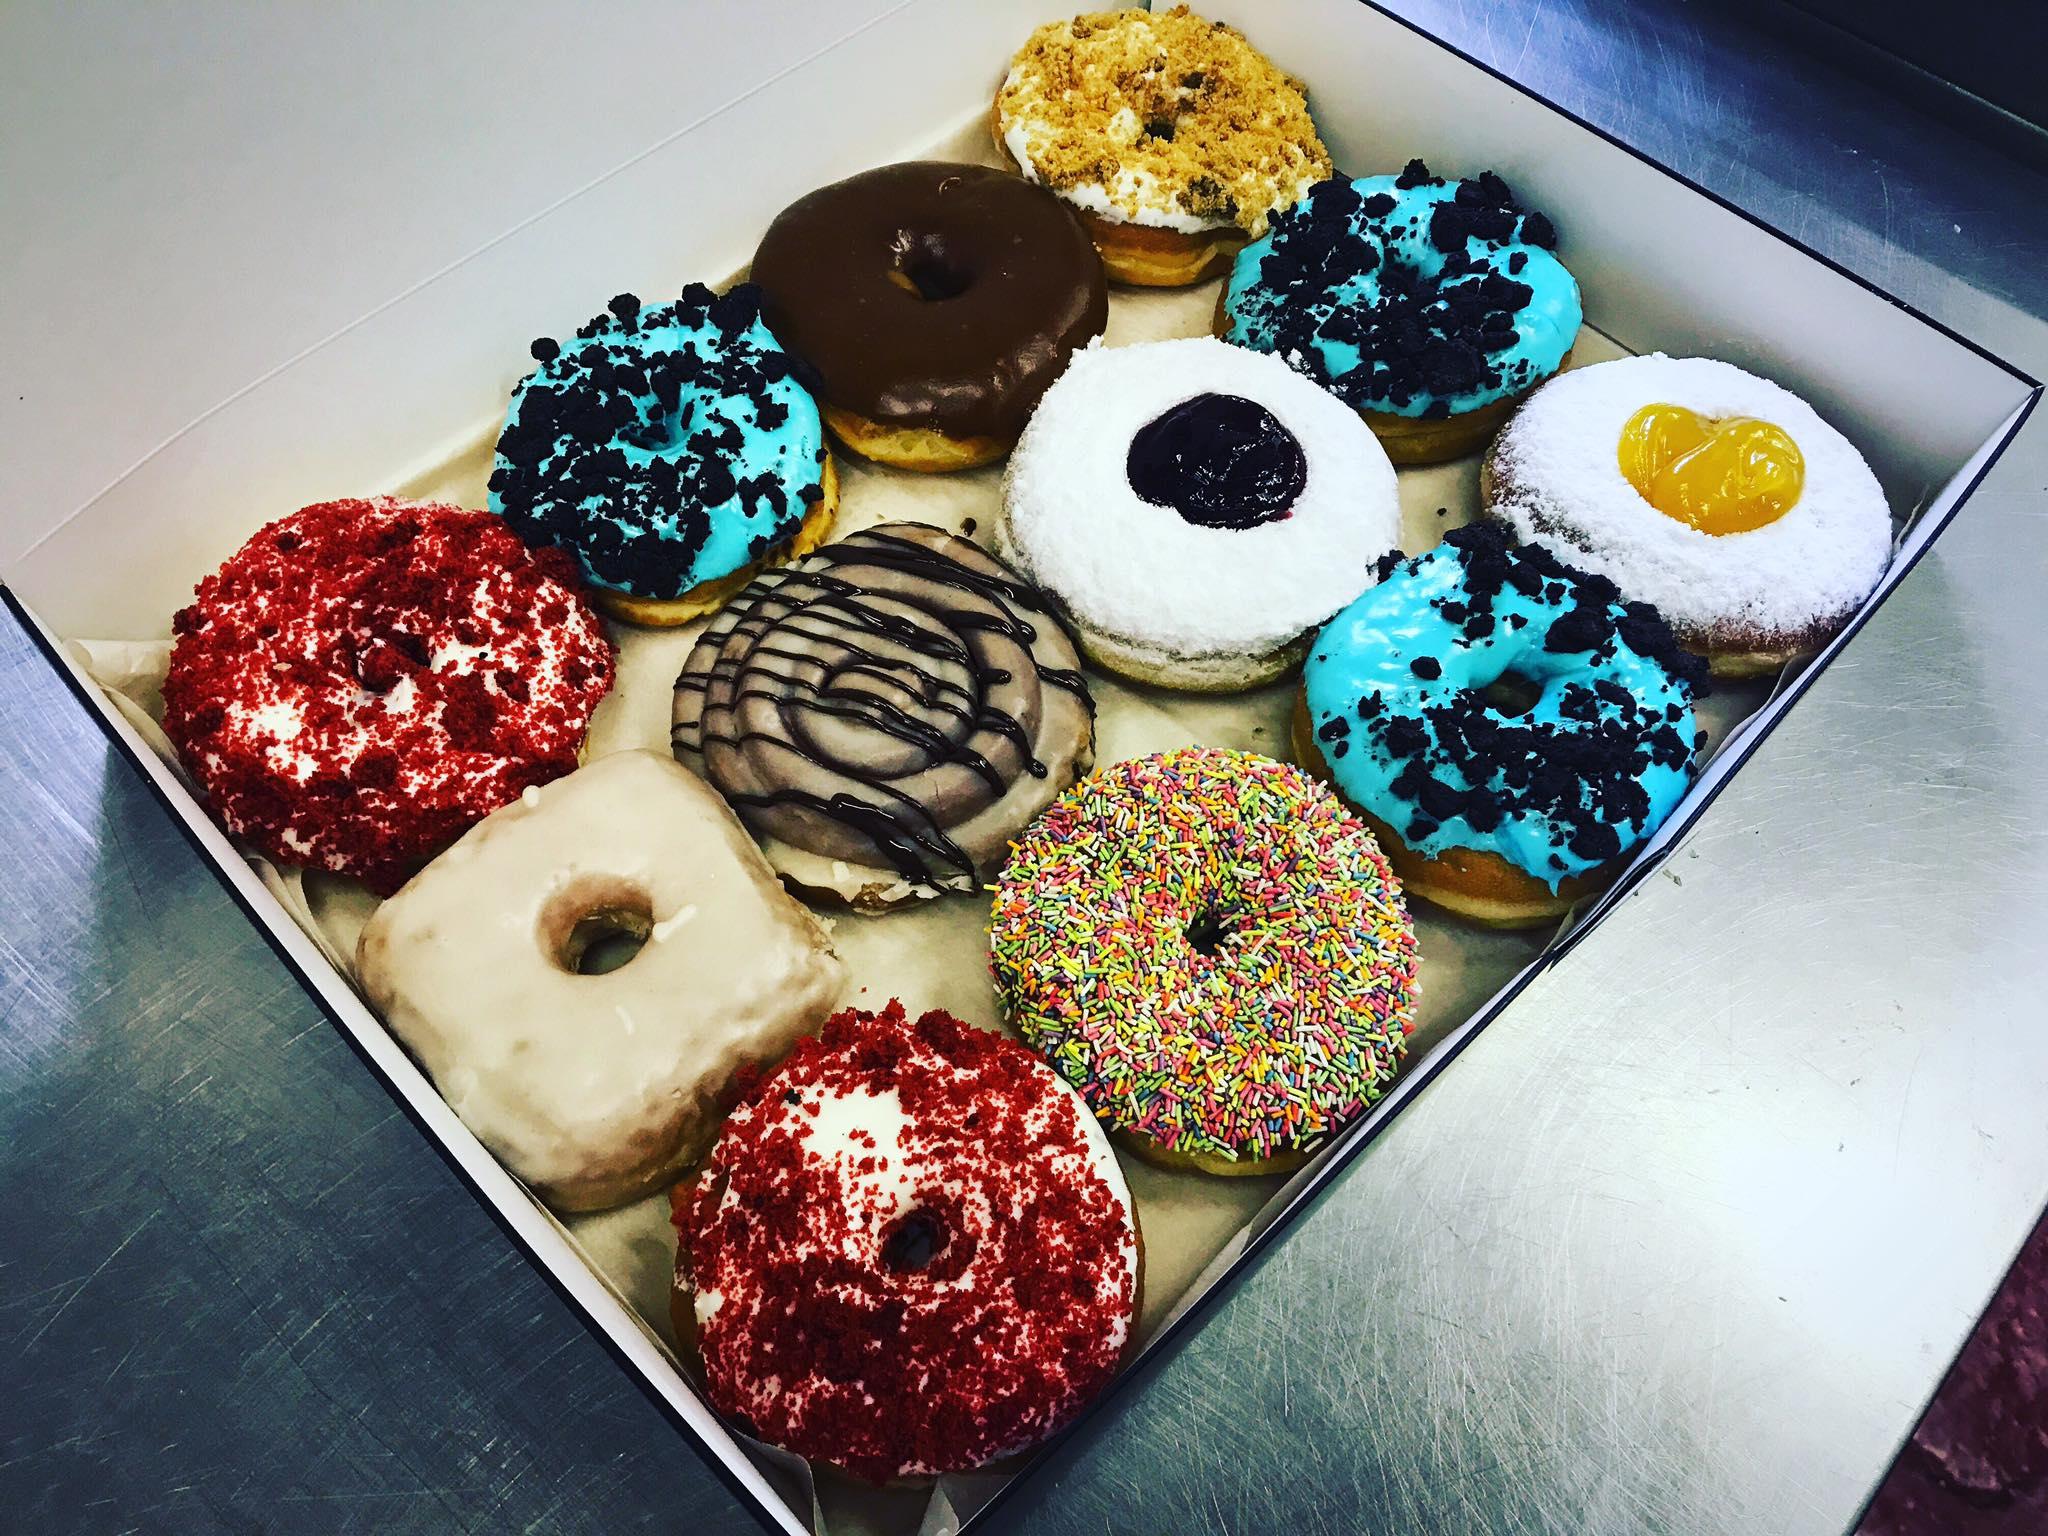 doughnotts leicester